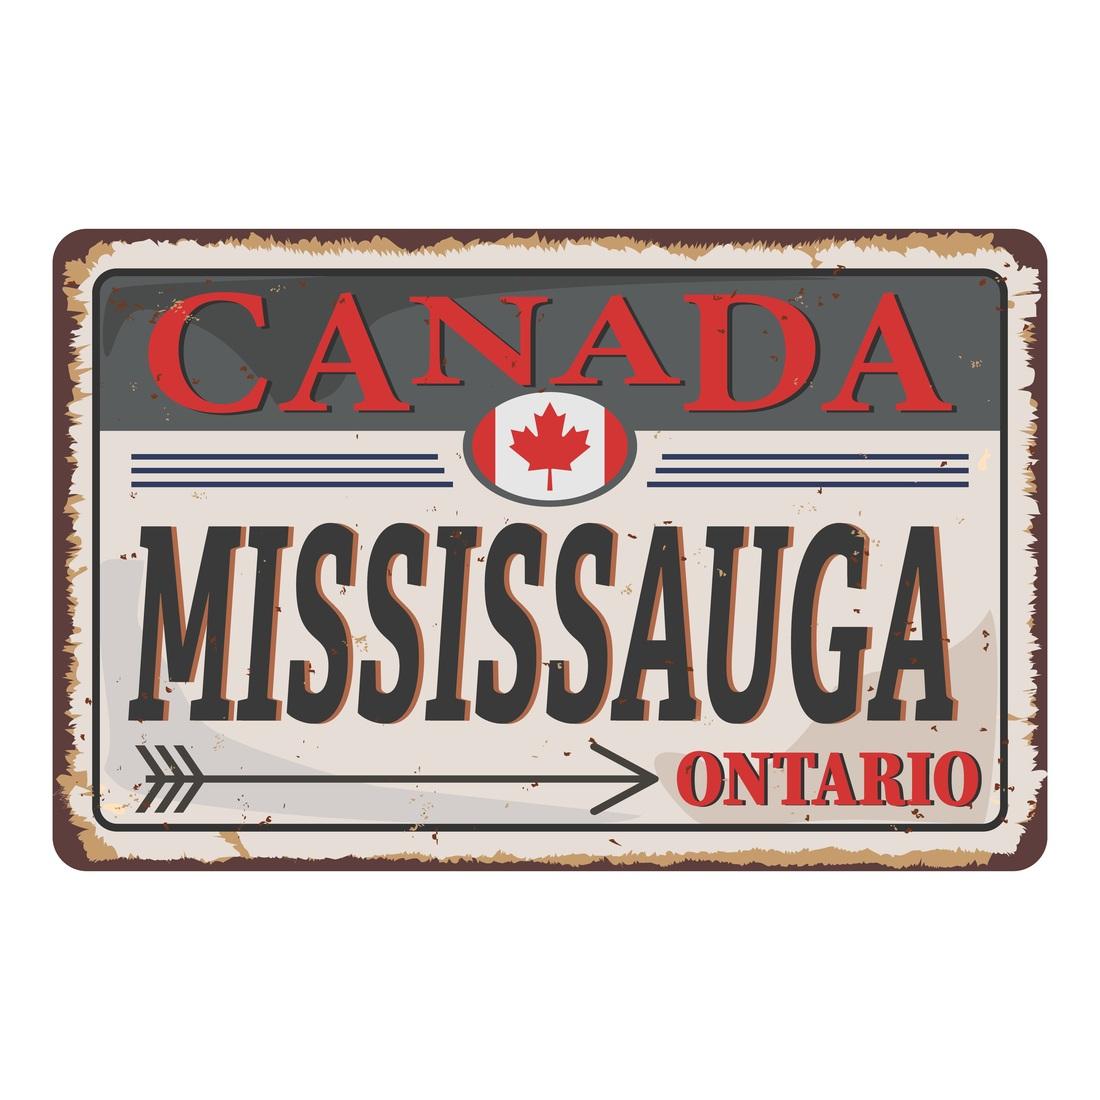 Mississauga Ontario Canada rusty old enamel sign on white background